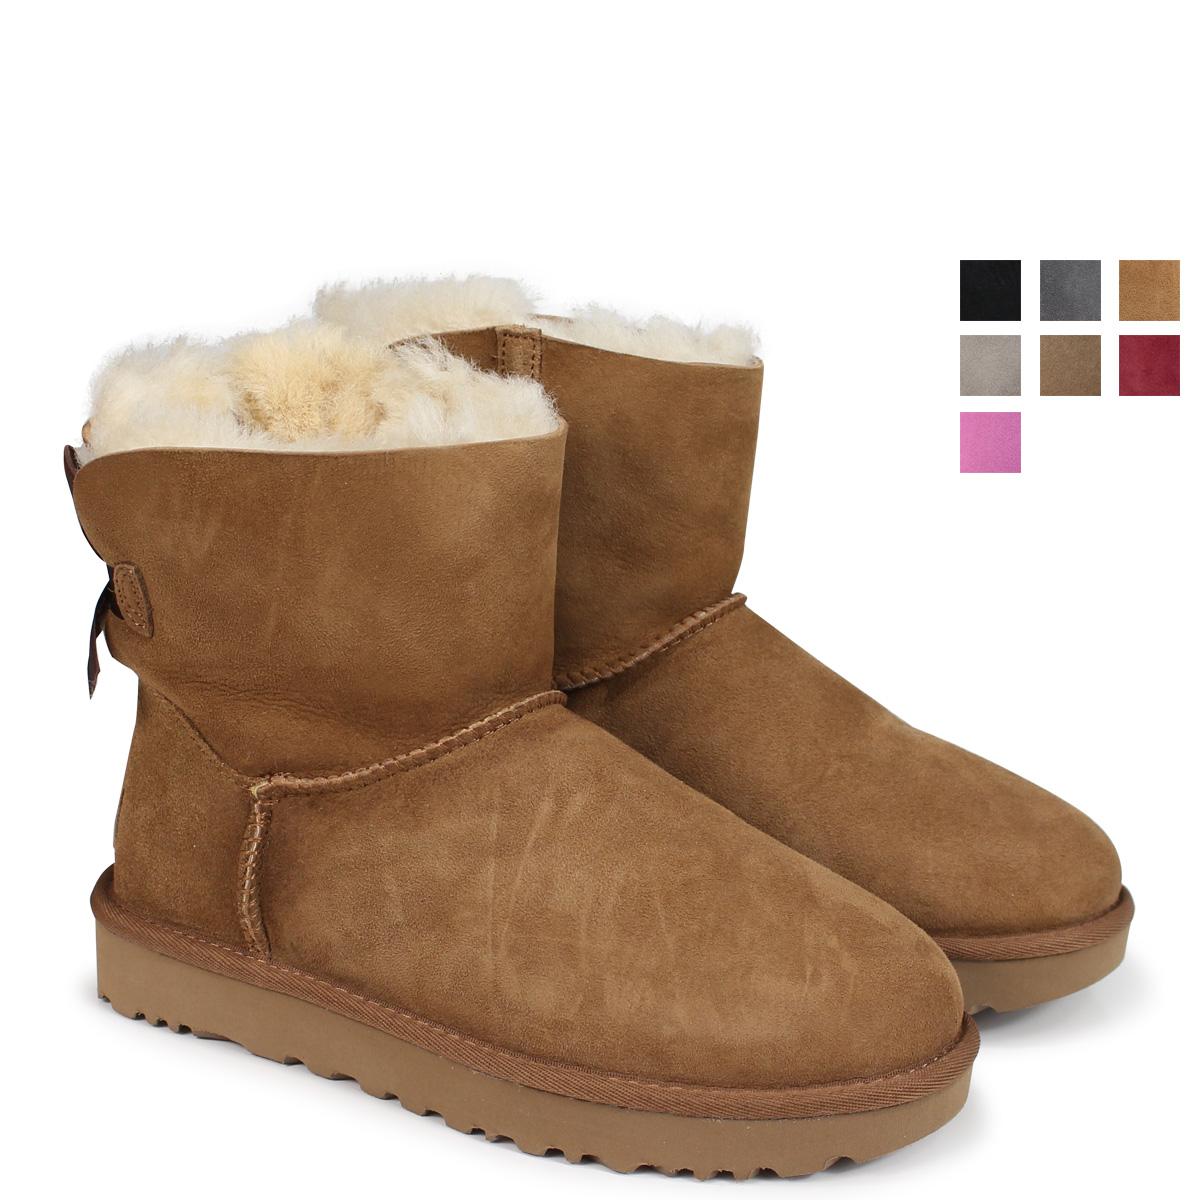 edfb43d0c269 アグ UGG mini-Bailey bow tie 2 mouton boots WOMENS MINI BAILEY BOW II 1016501  ...